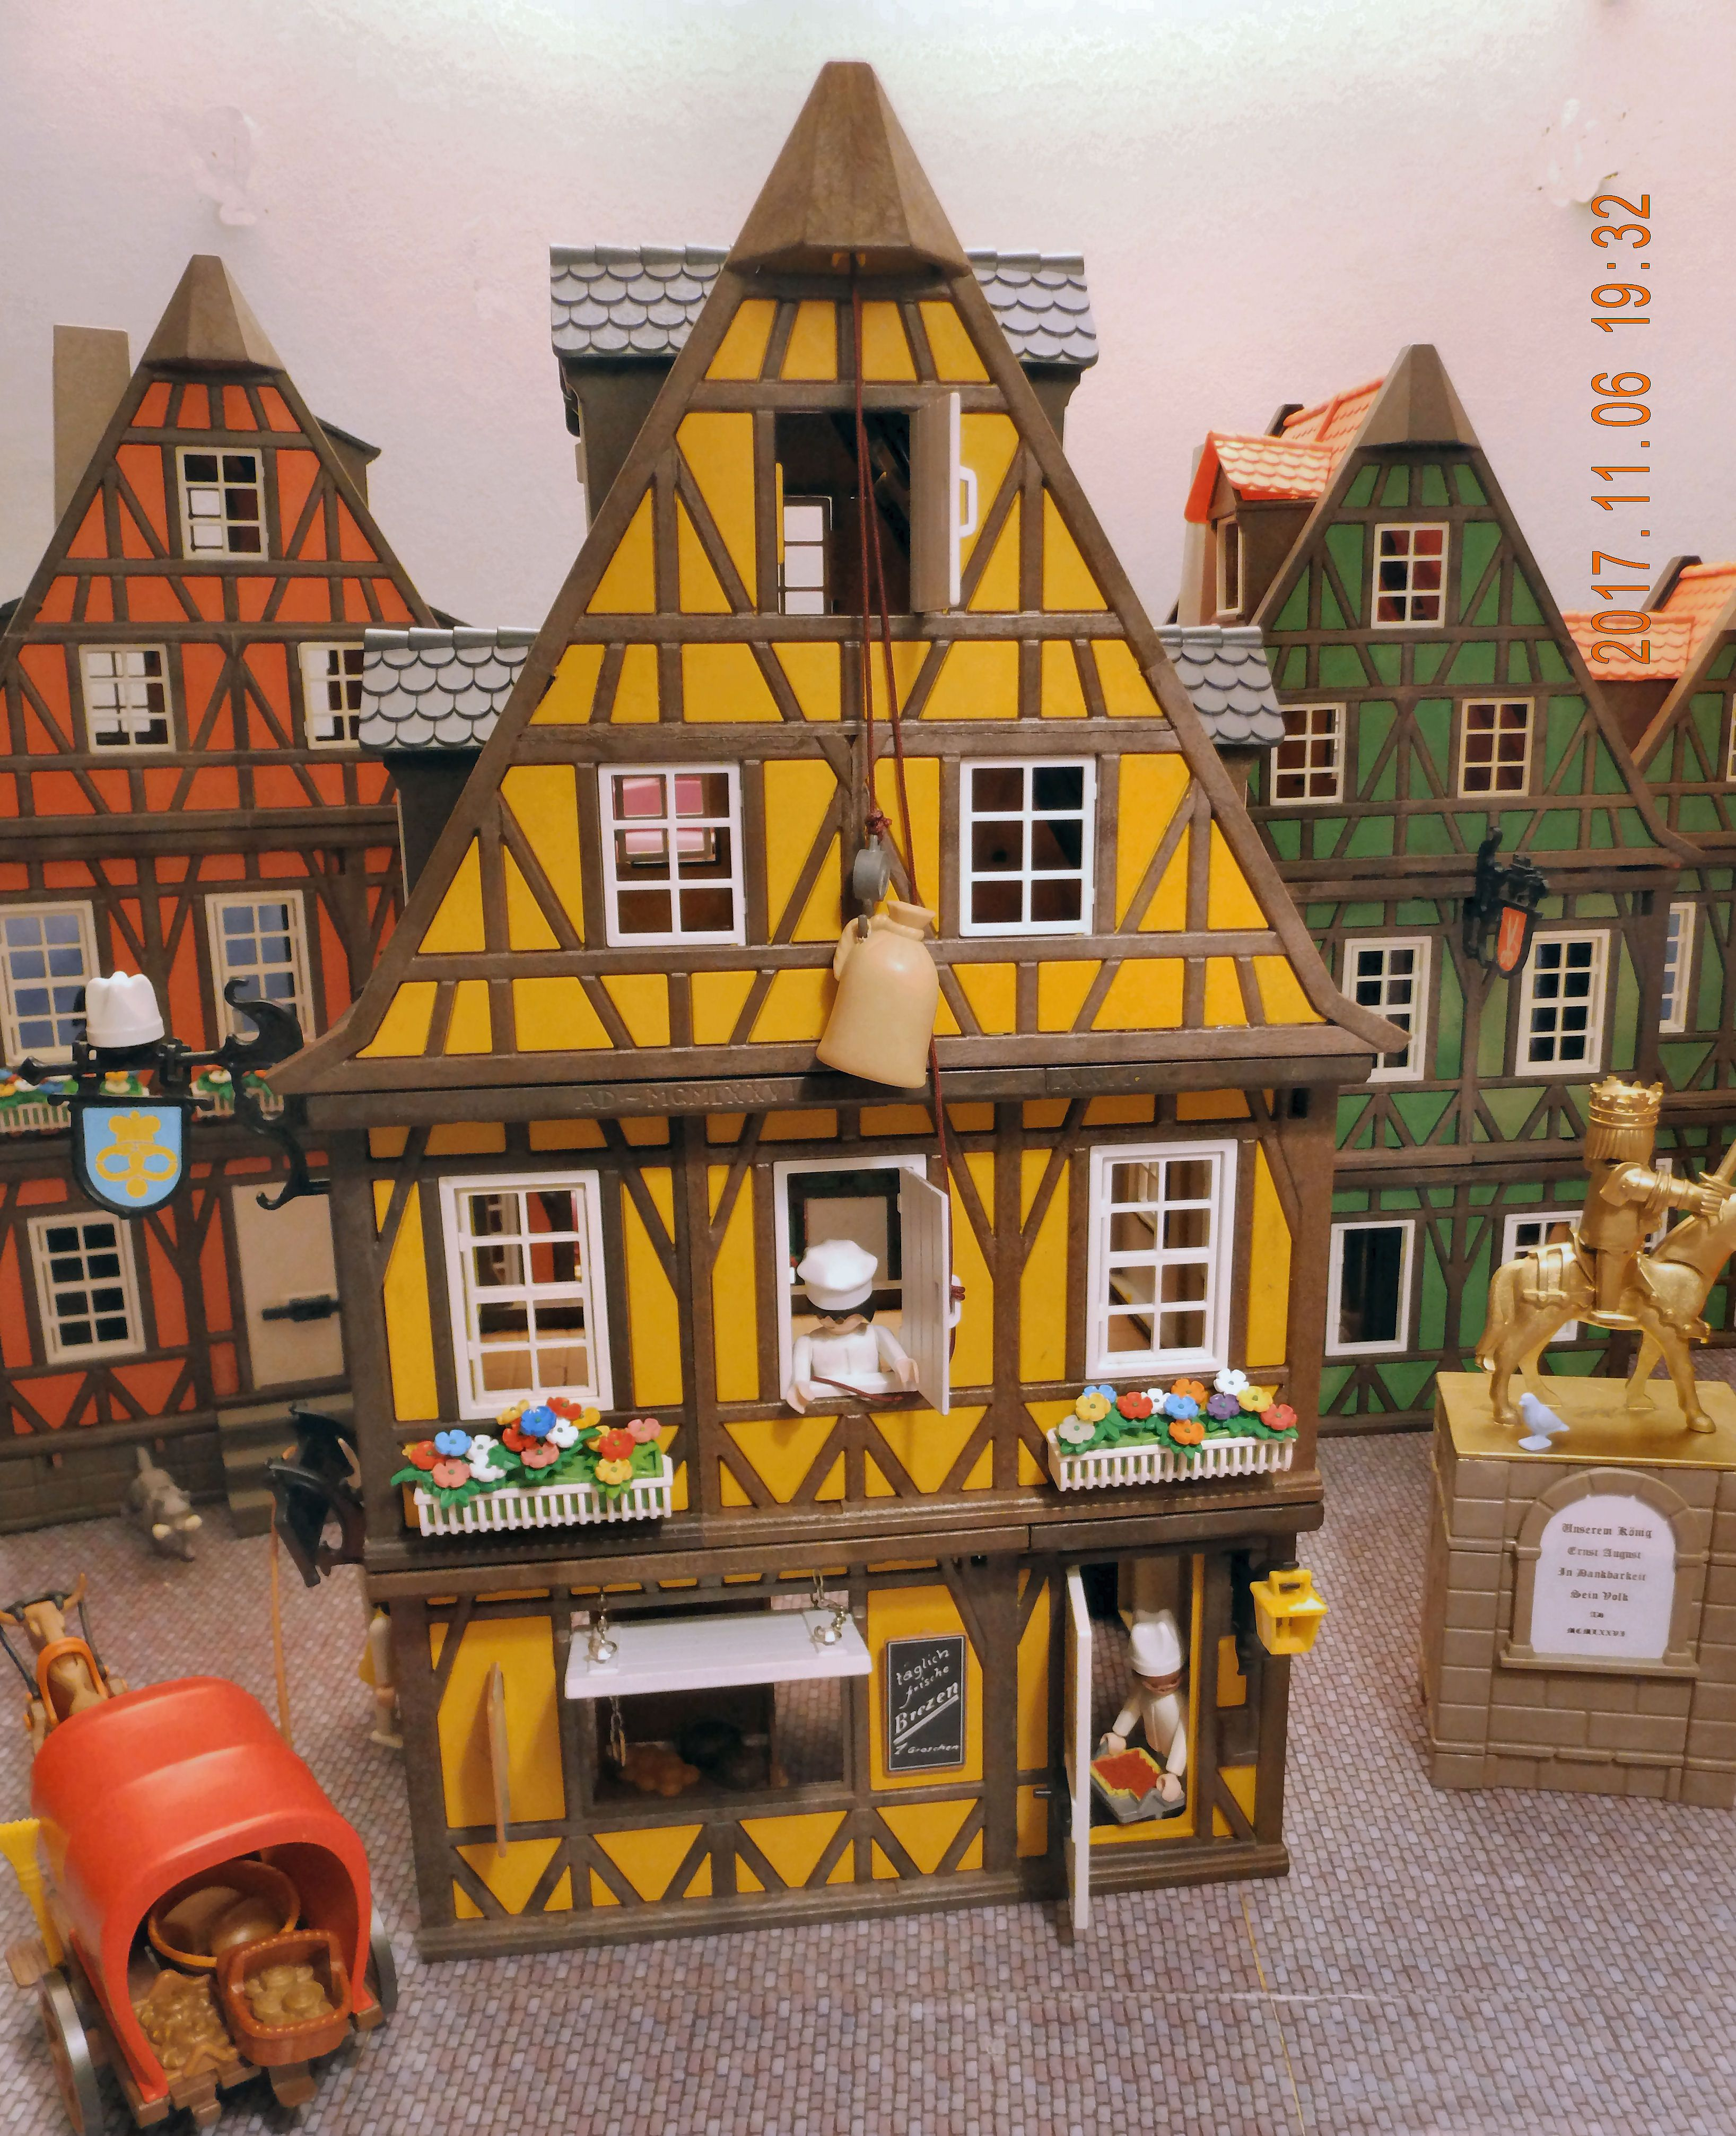 gelbes Haus Bäckerei Ladenfront Playmobil, House styles